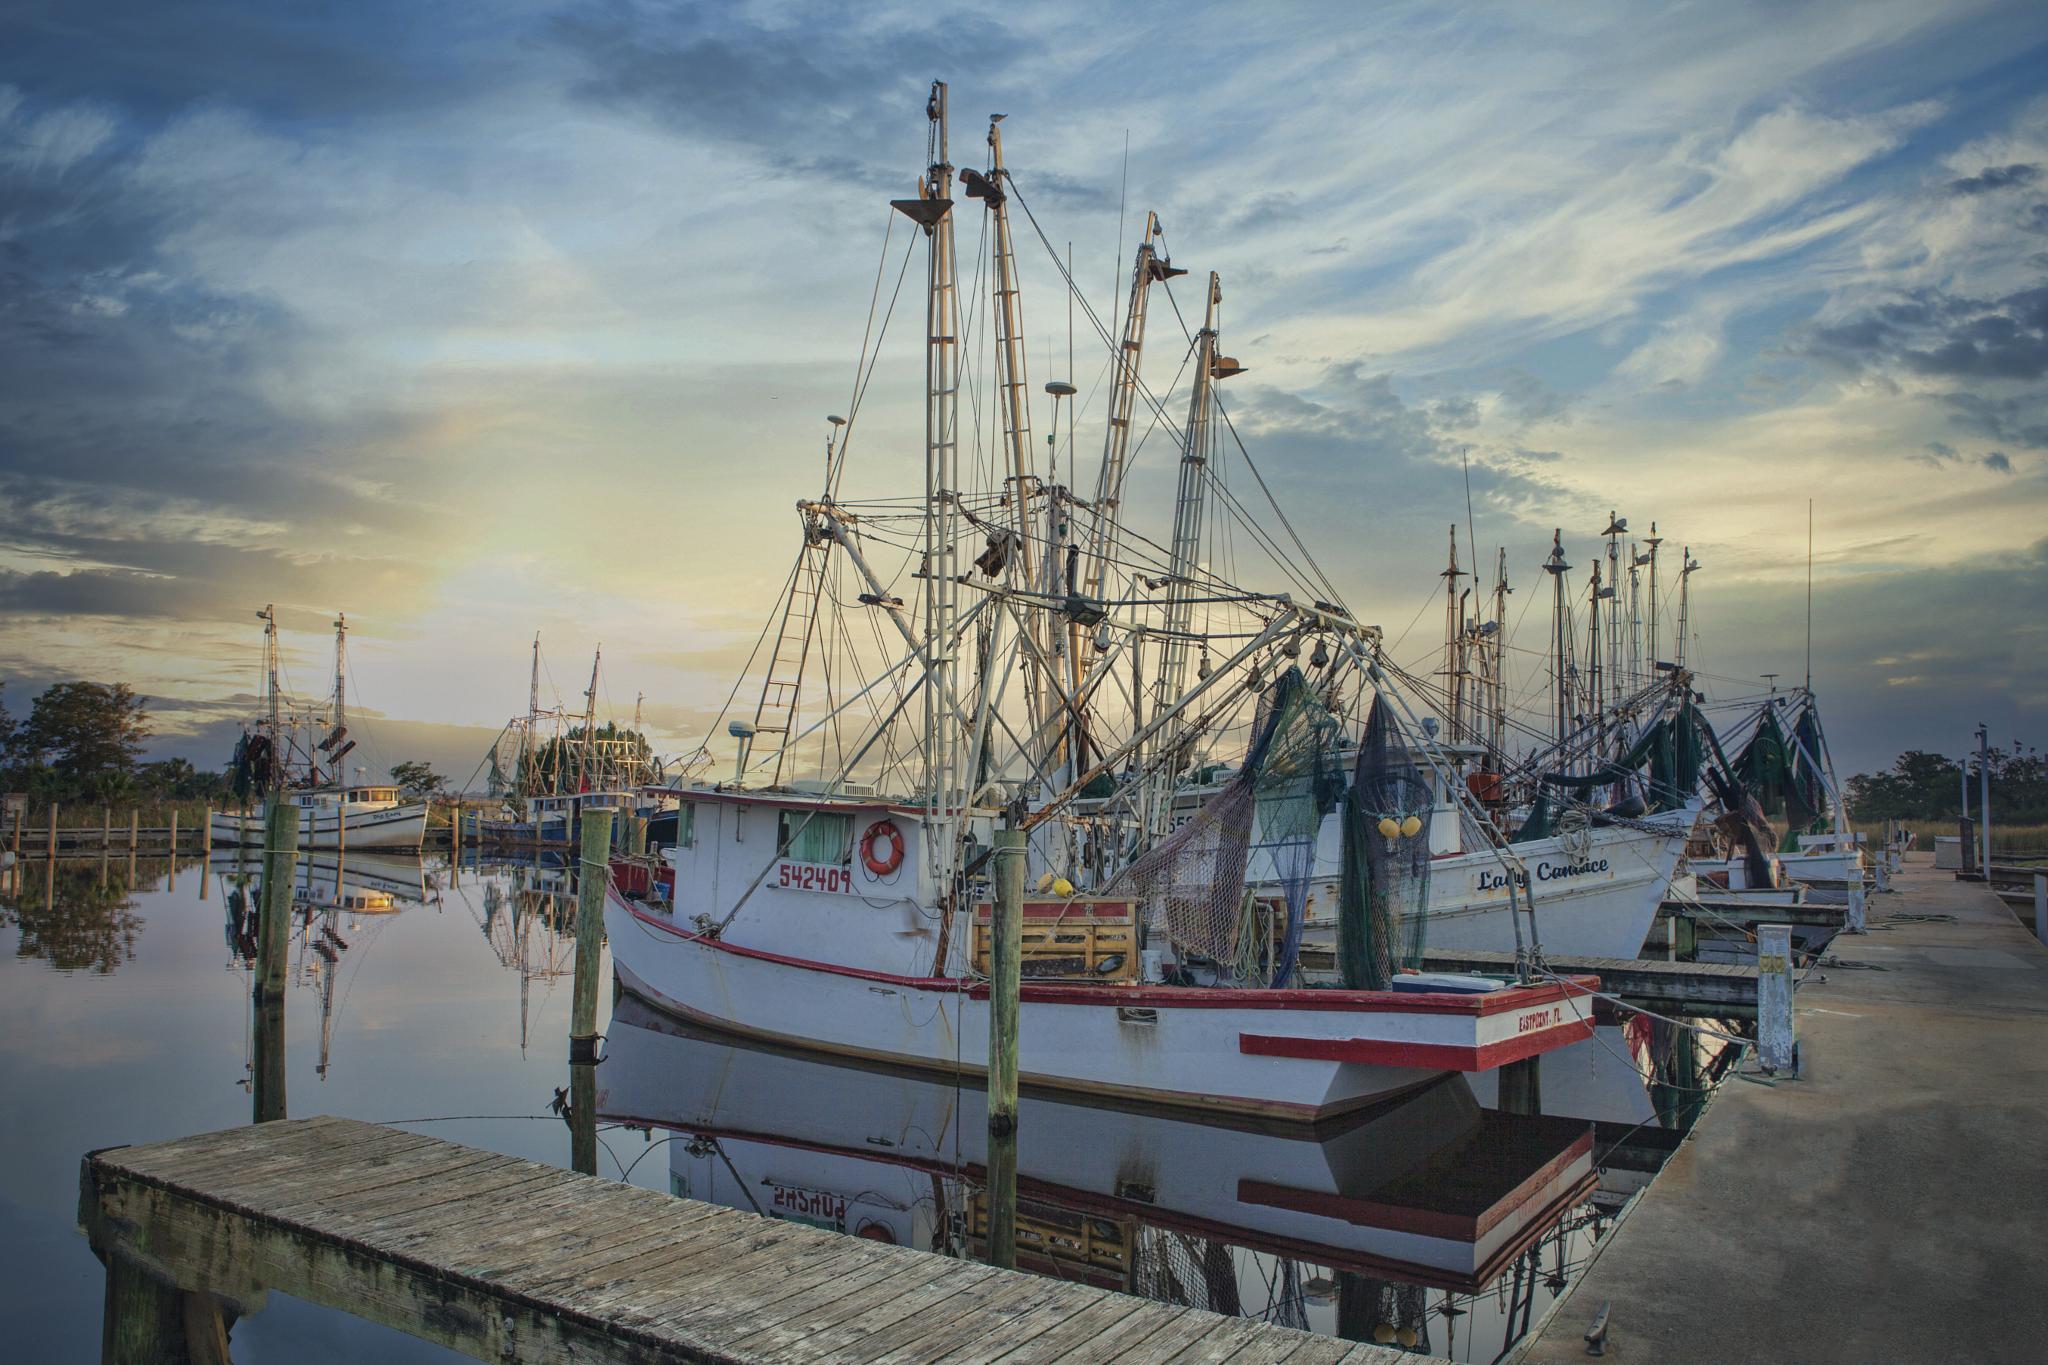 Shrimp Boats by Photos By Urban Rump